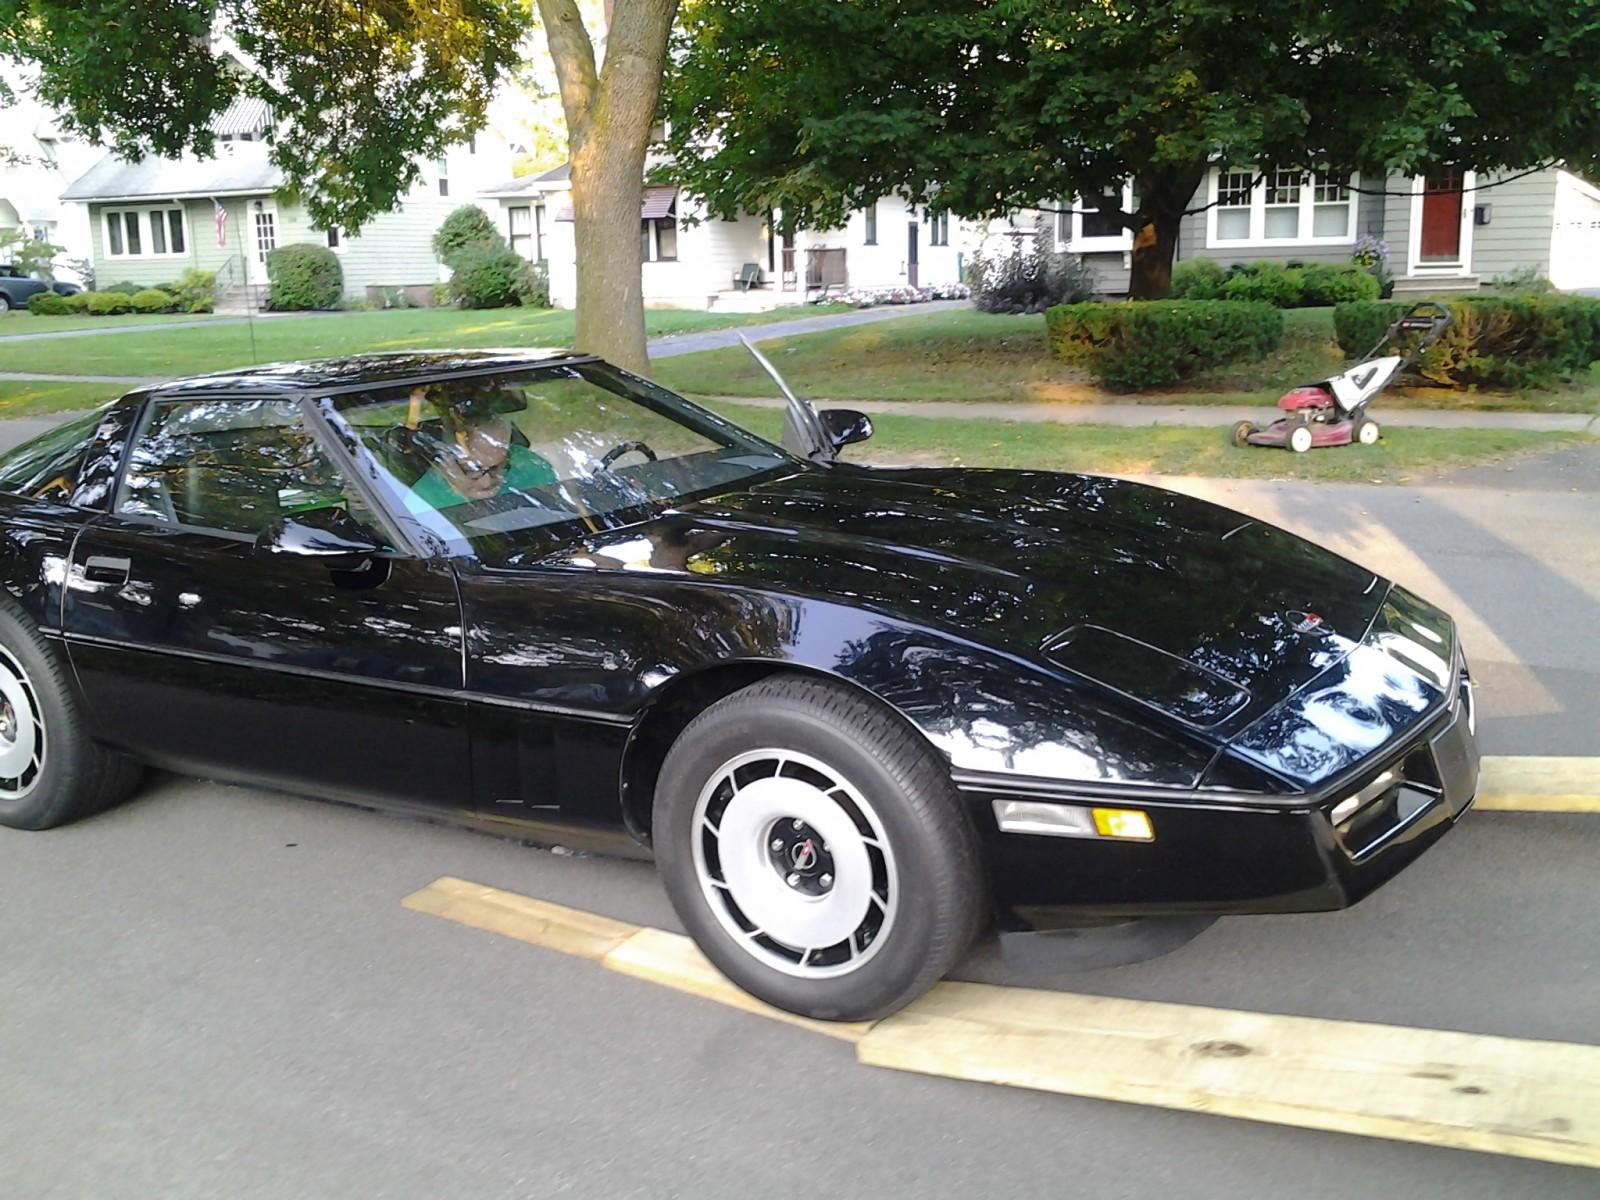 Junkyard Rescue: 1985 Chevy Corvette